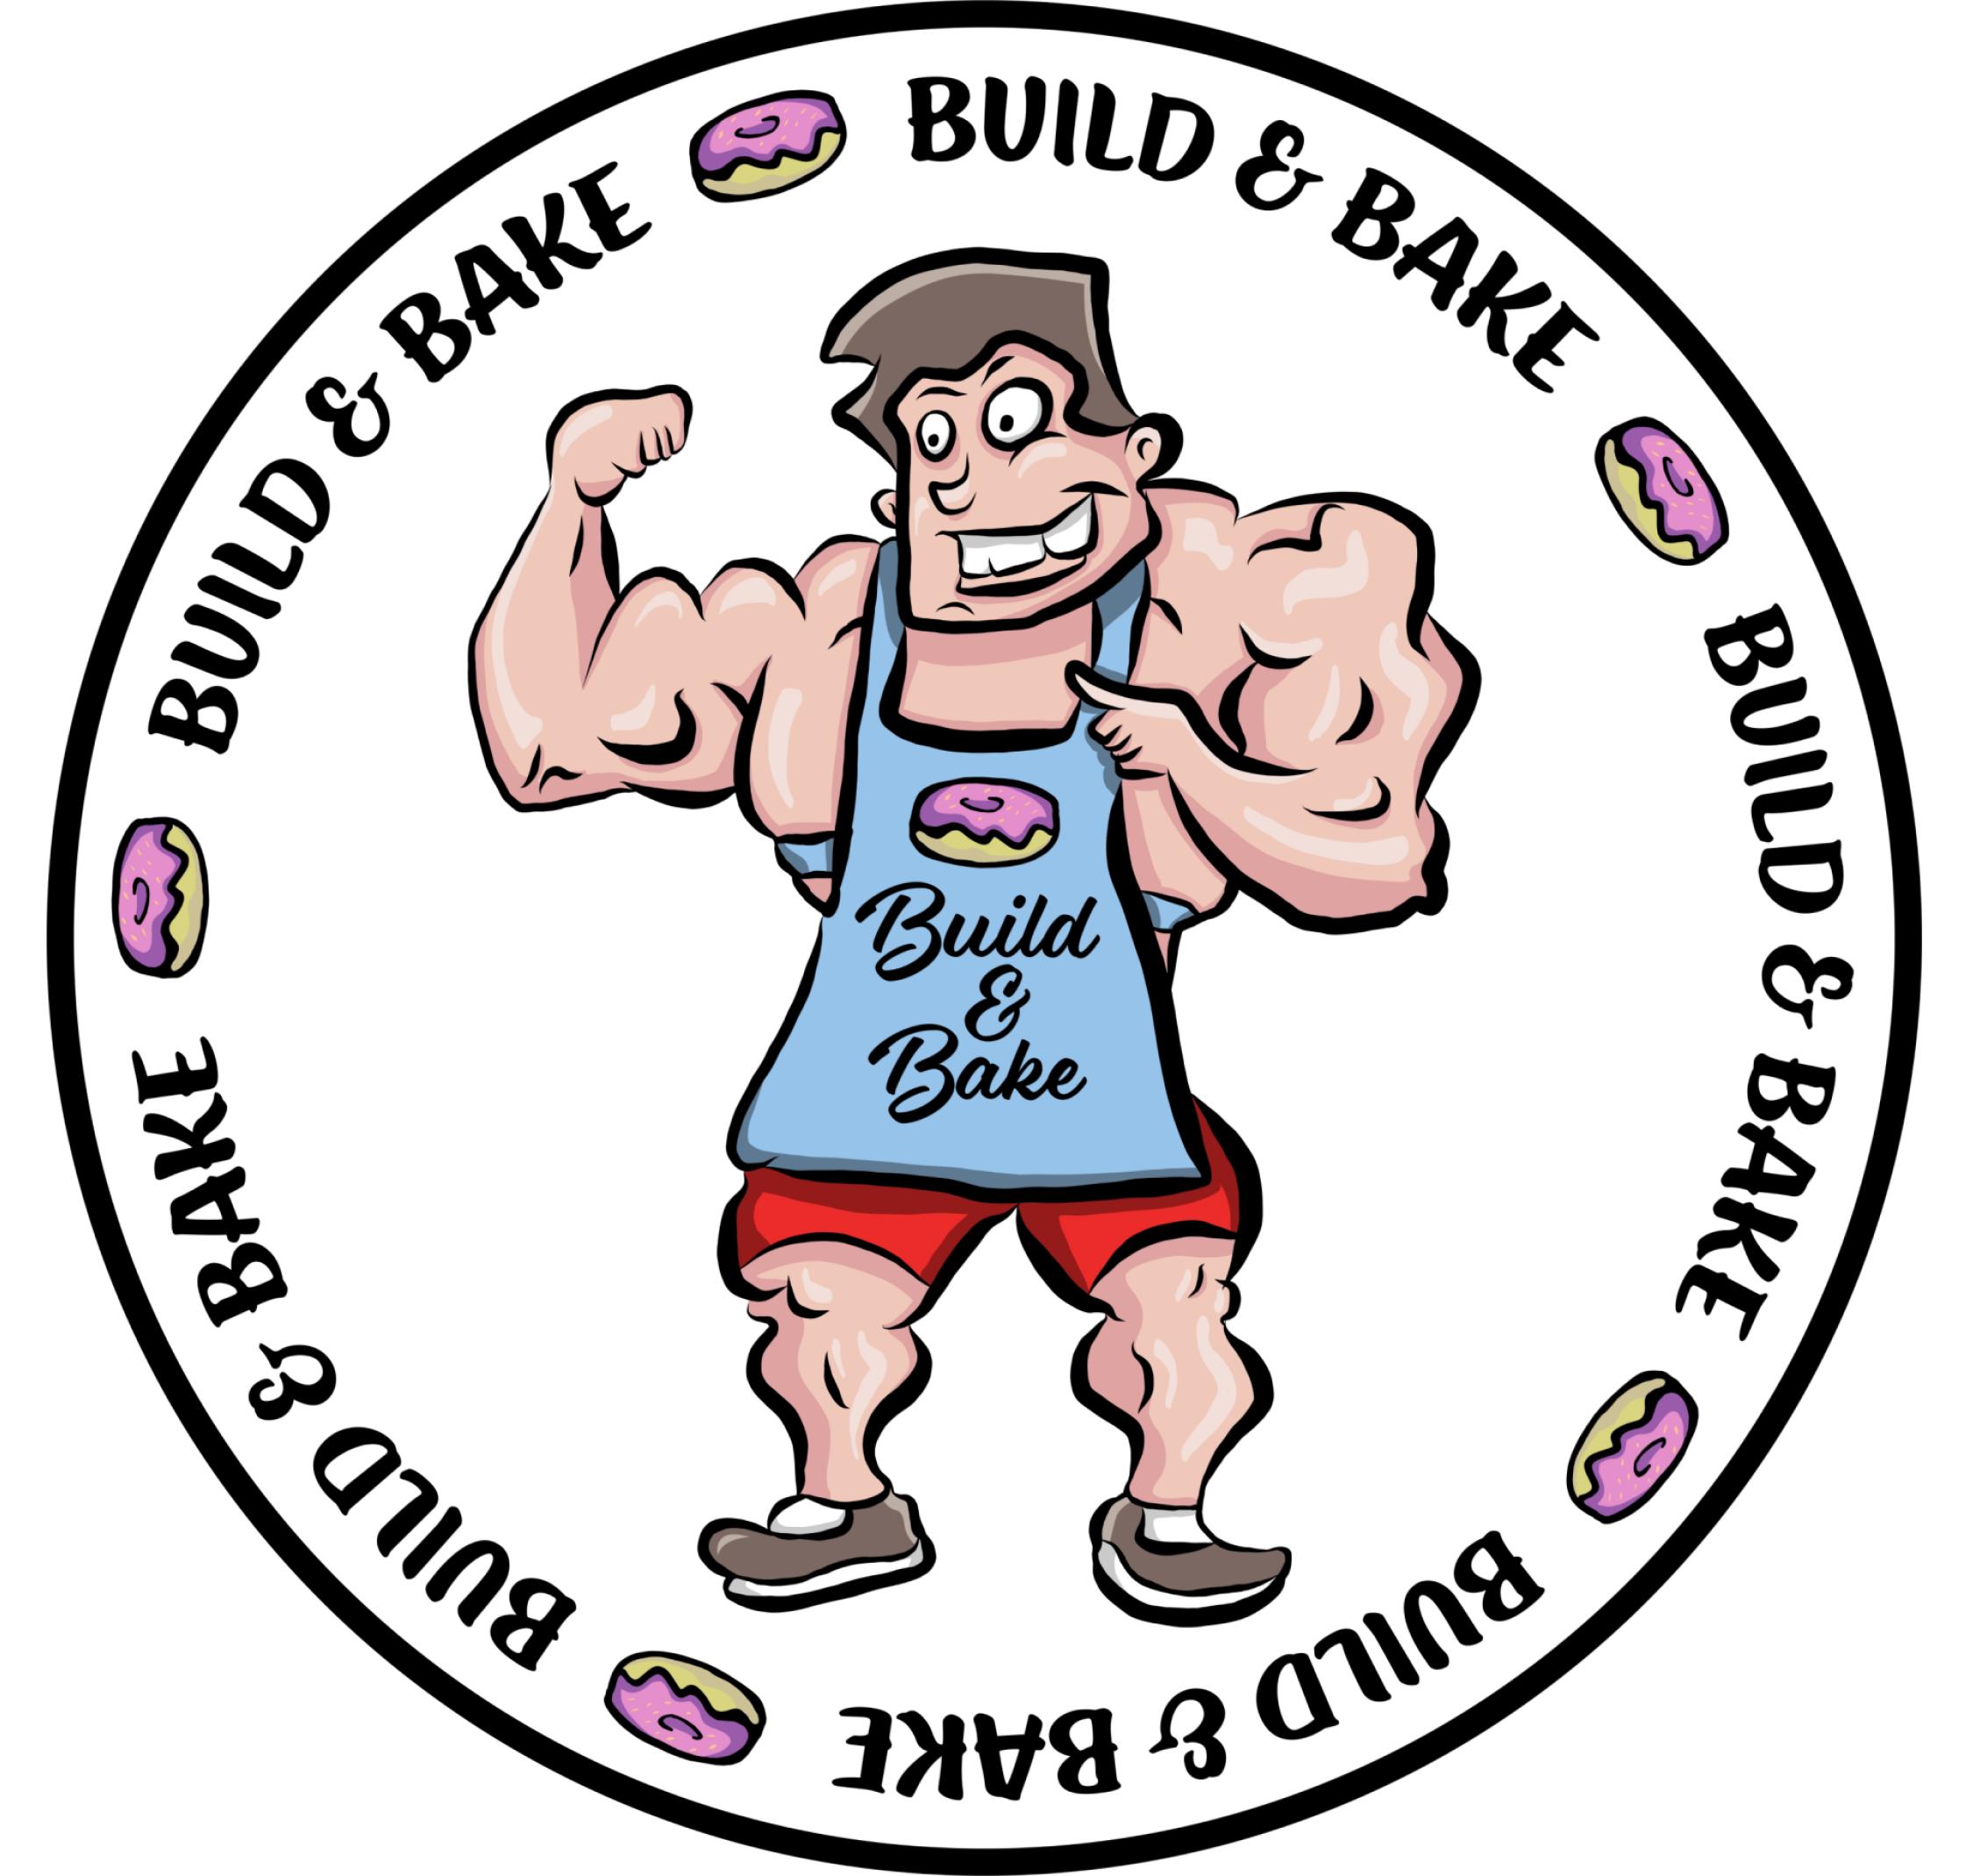 Build & Bake Ltd